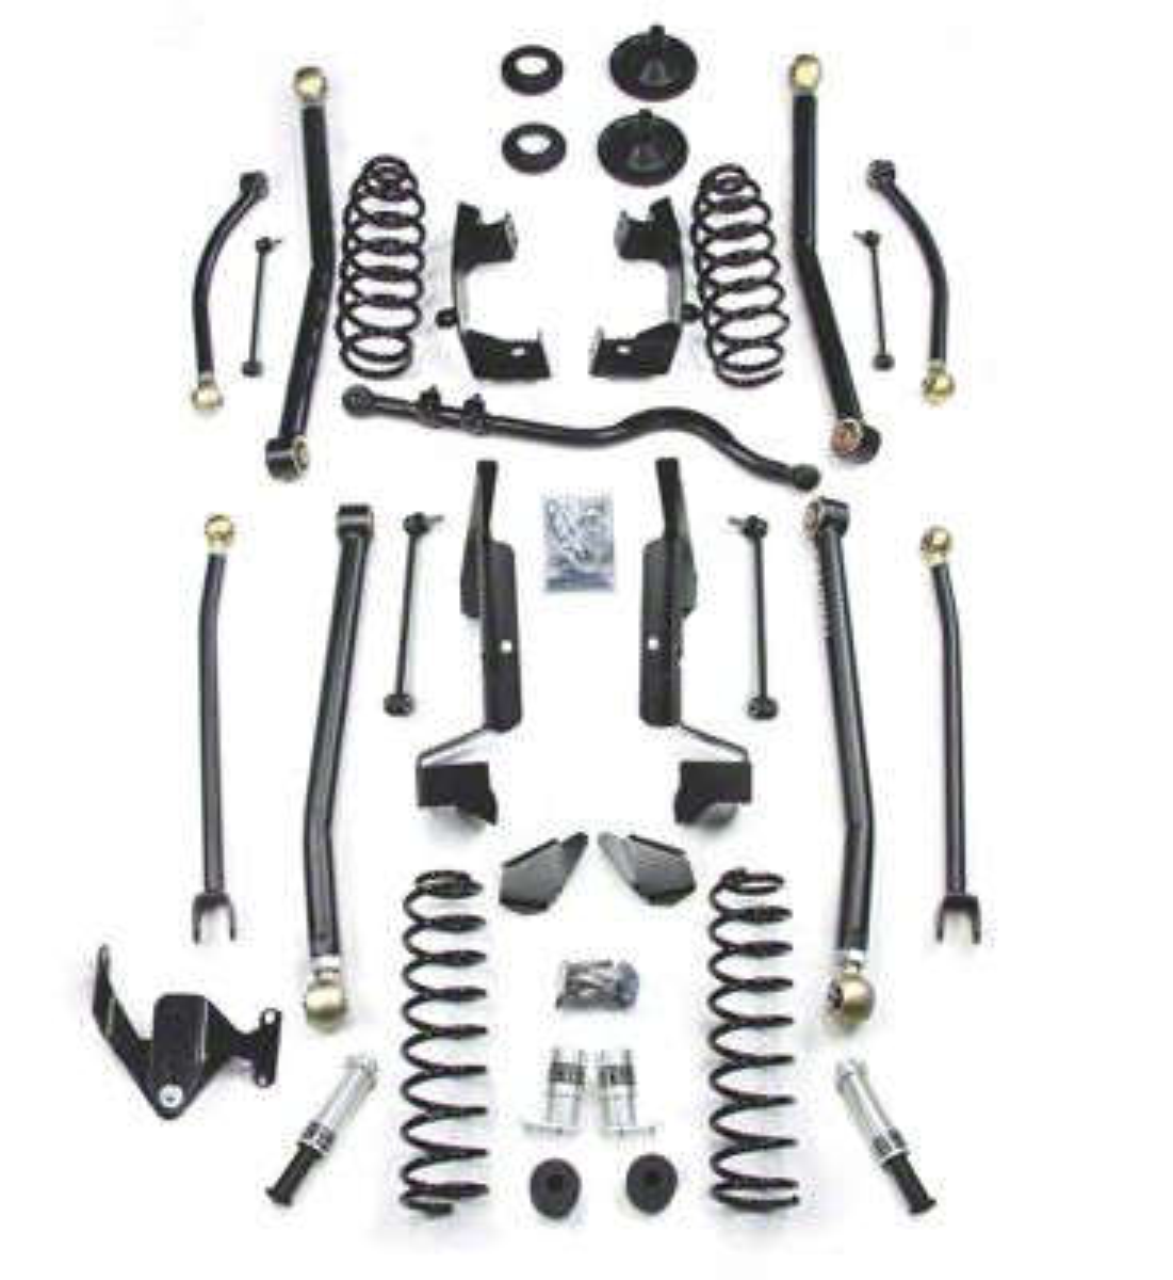 Teraflex 2.5 in. Elite LCG Long FlexArm Lift Kit w/ SpeedBumps - Right Hand Drive (07-18 Jeep Wrangler JK 4 Door)